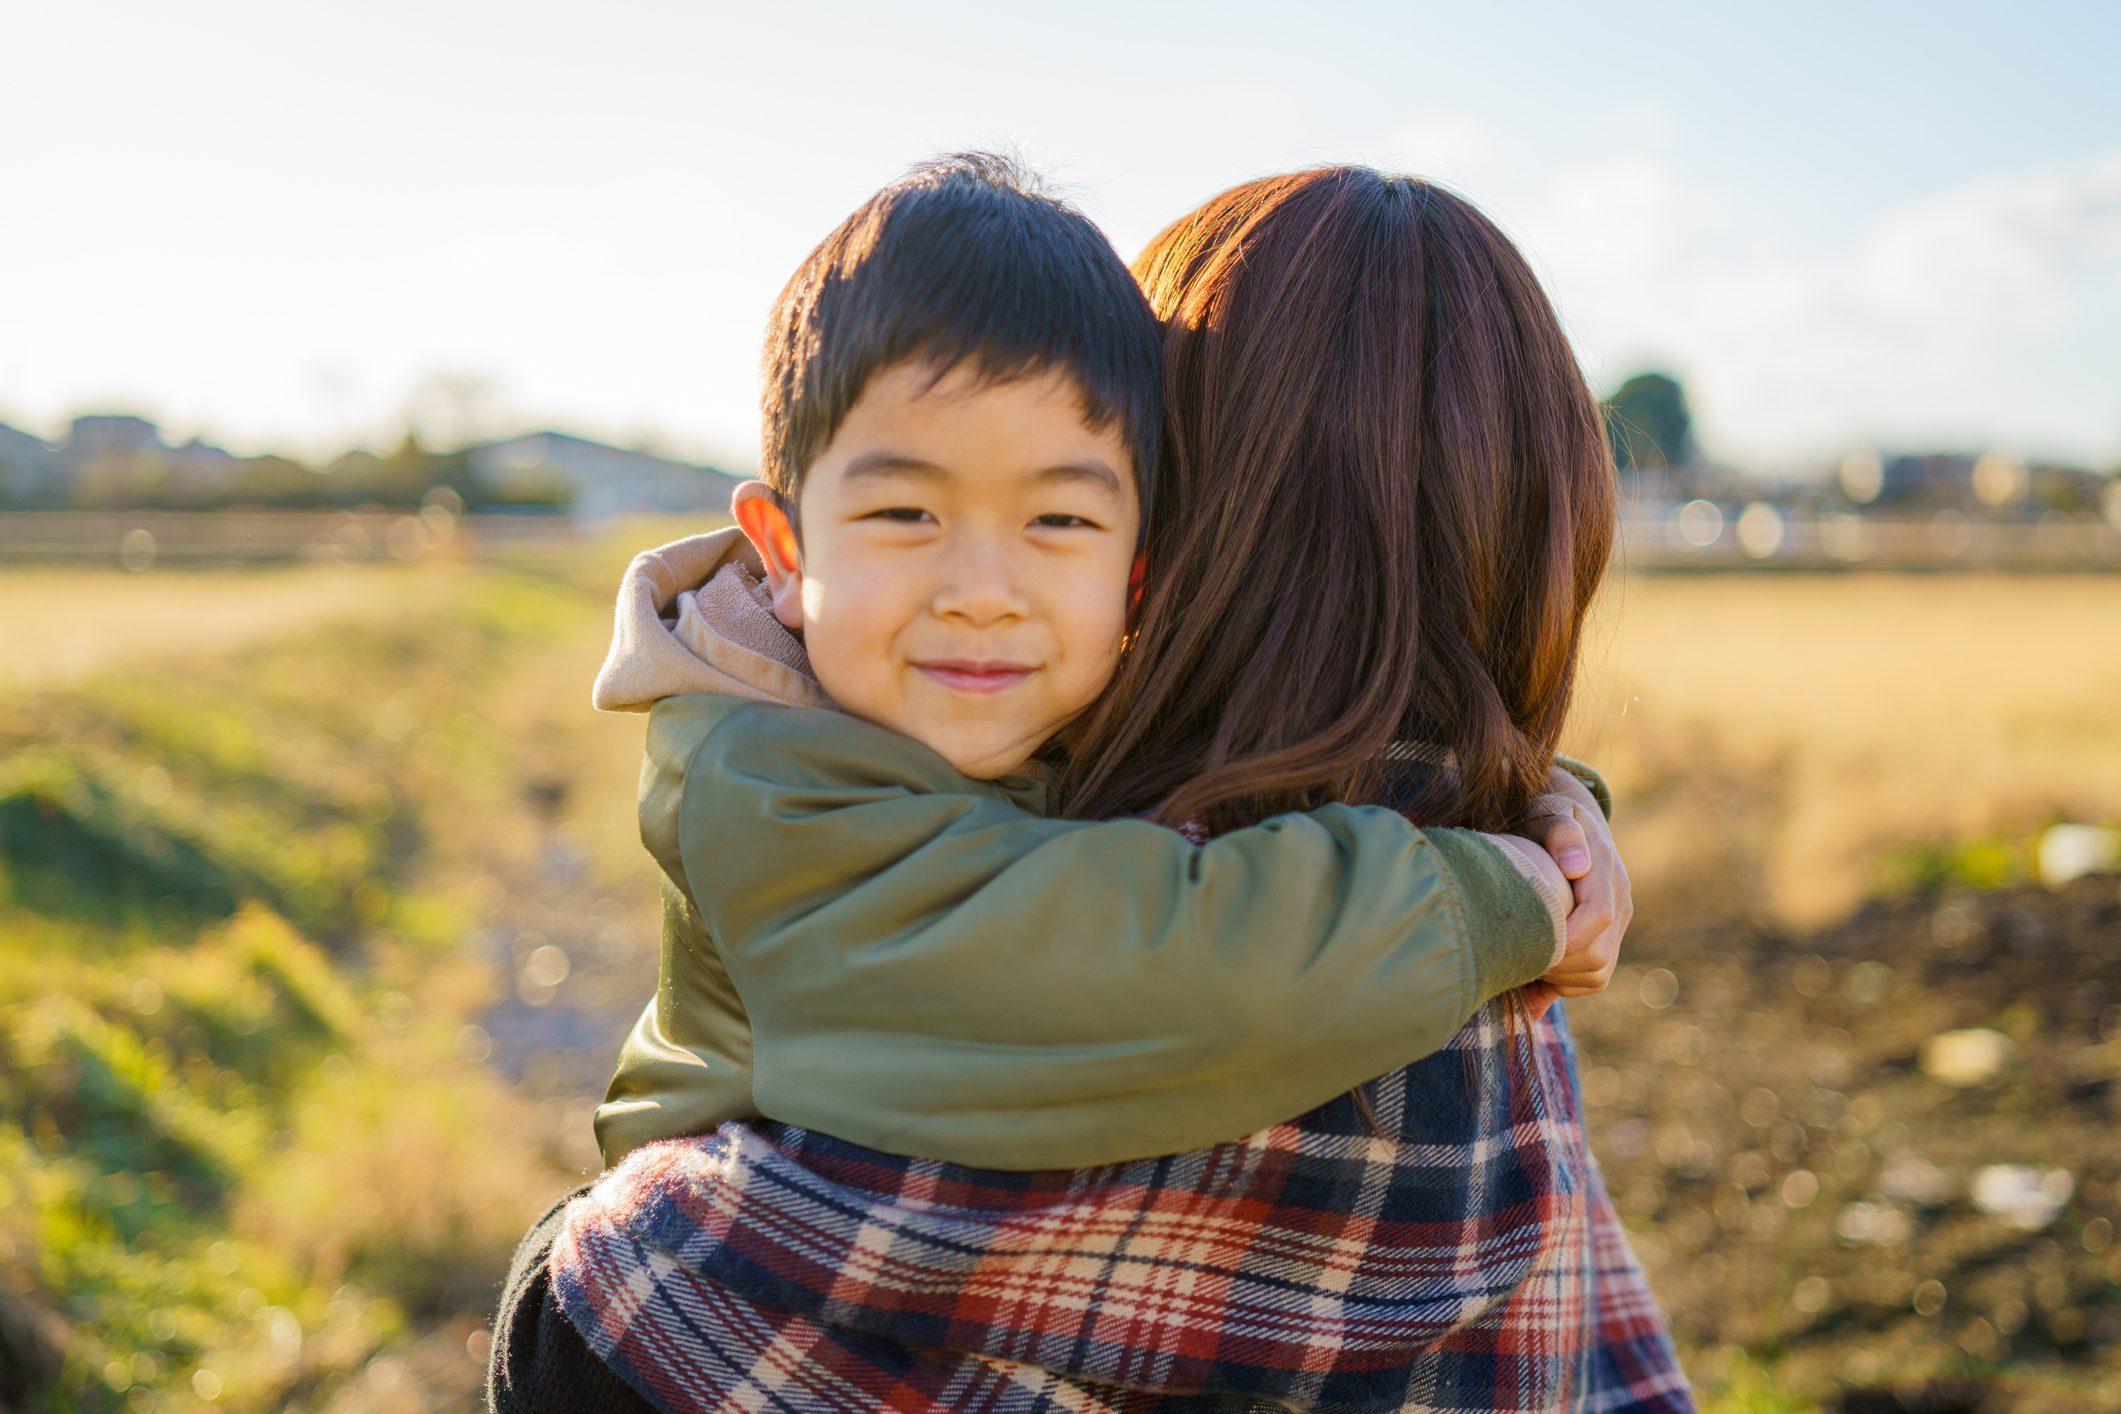 A boy hugging her mother